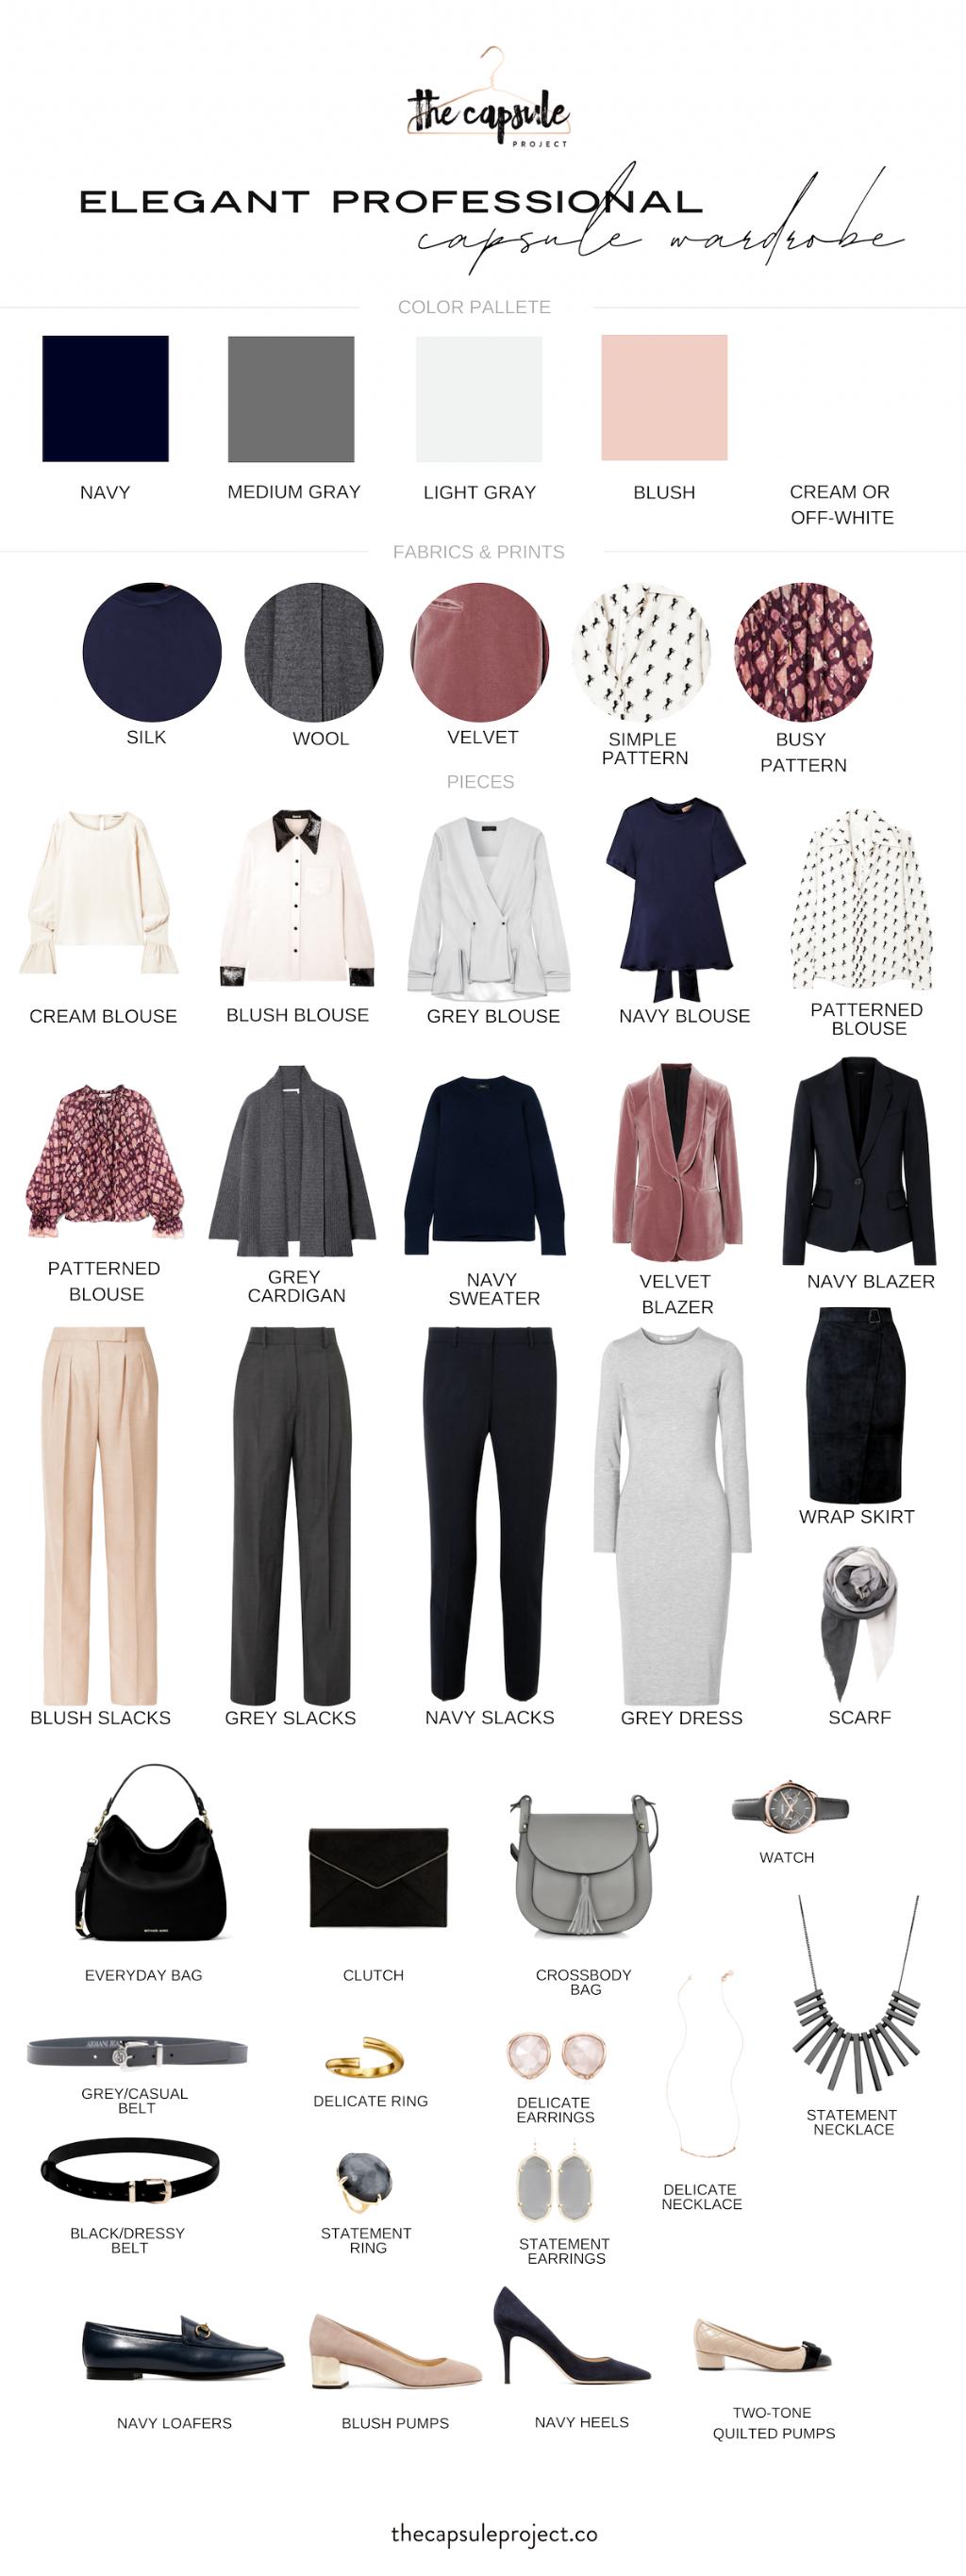 Winter 2019 Capsule Wardrobe for work. Professional Capsule Wardrobe for the sophisticated woman